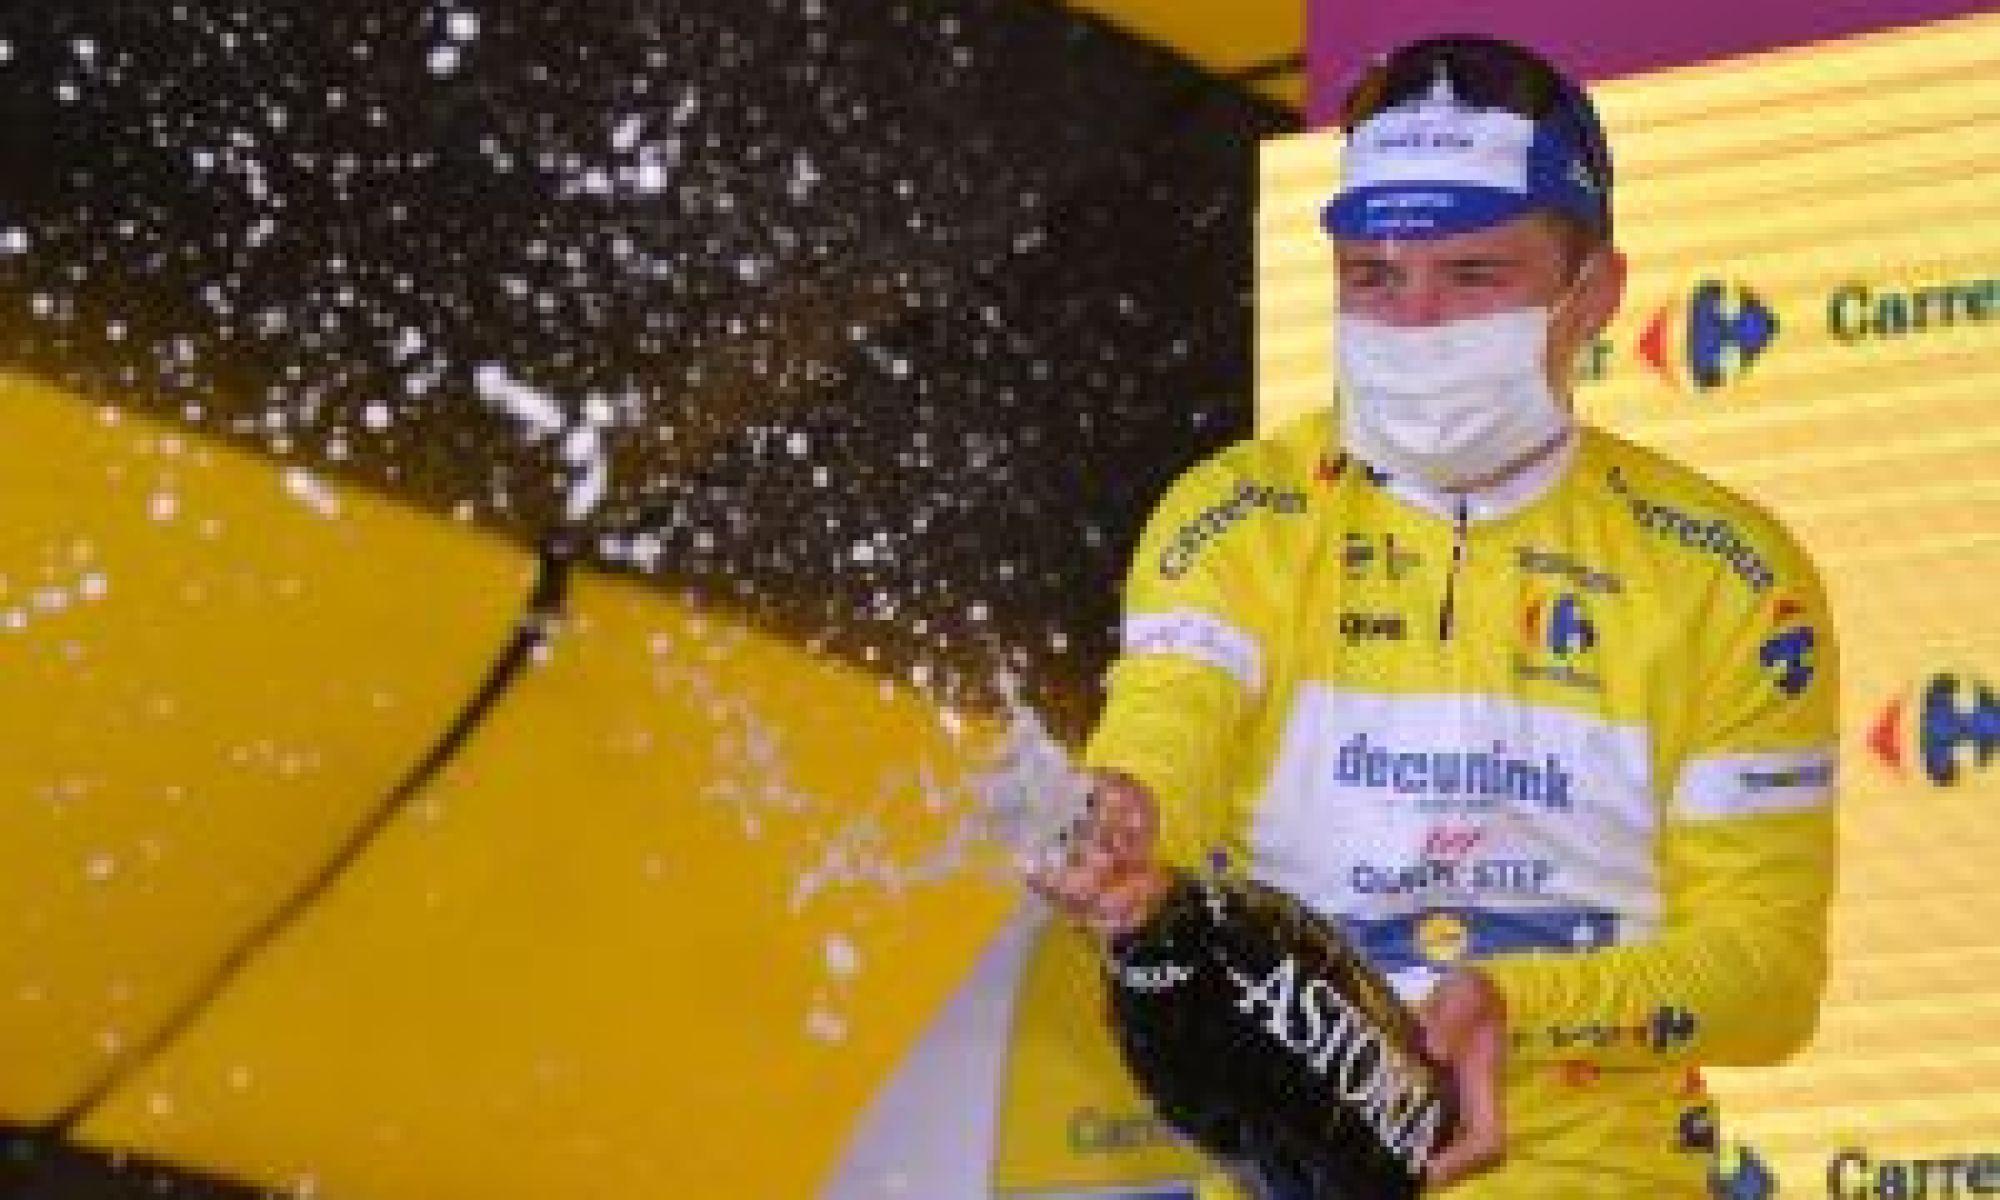 Remco Evenepoel wins Tour of Poland, continuing unbeaten 2020 stage race run